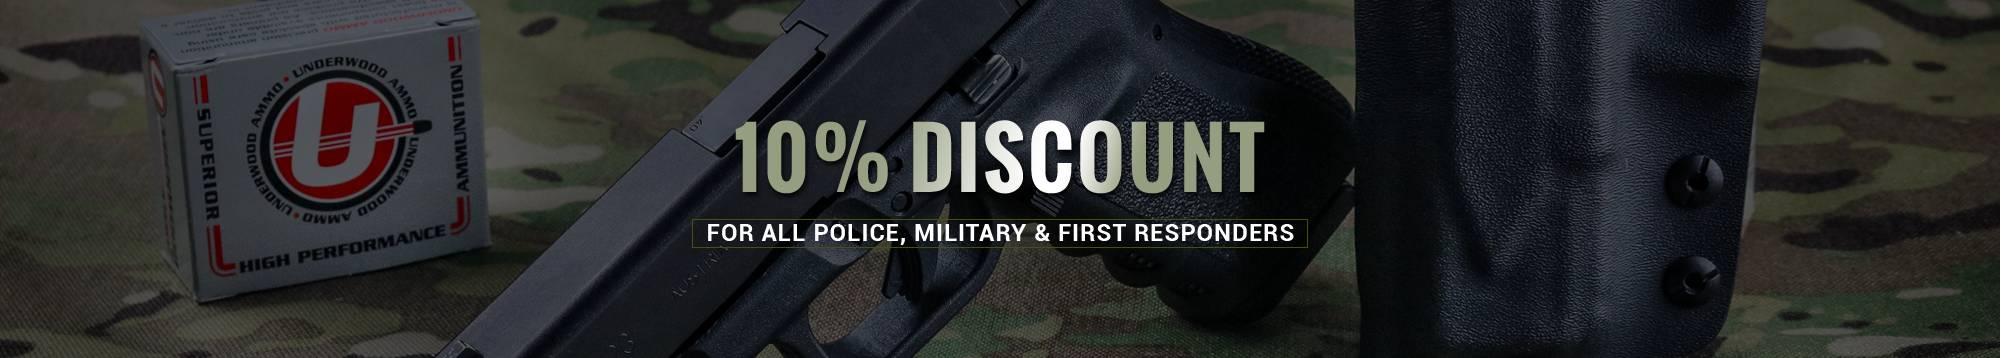 discount-banner.jpg